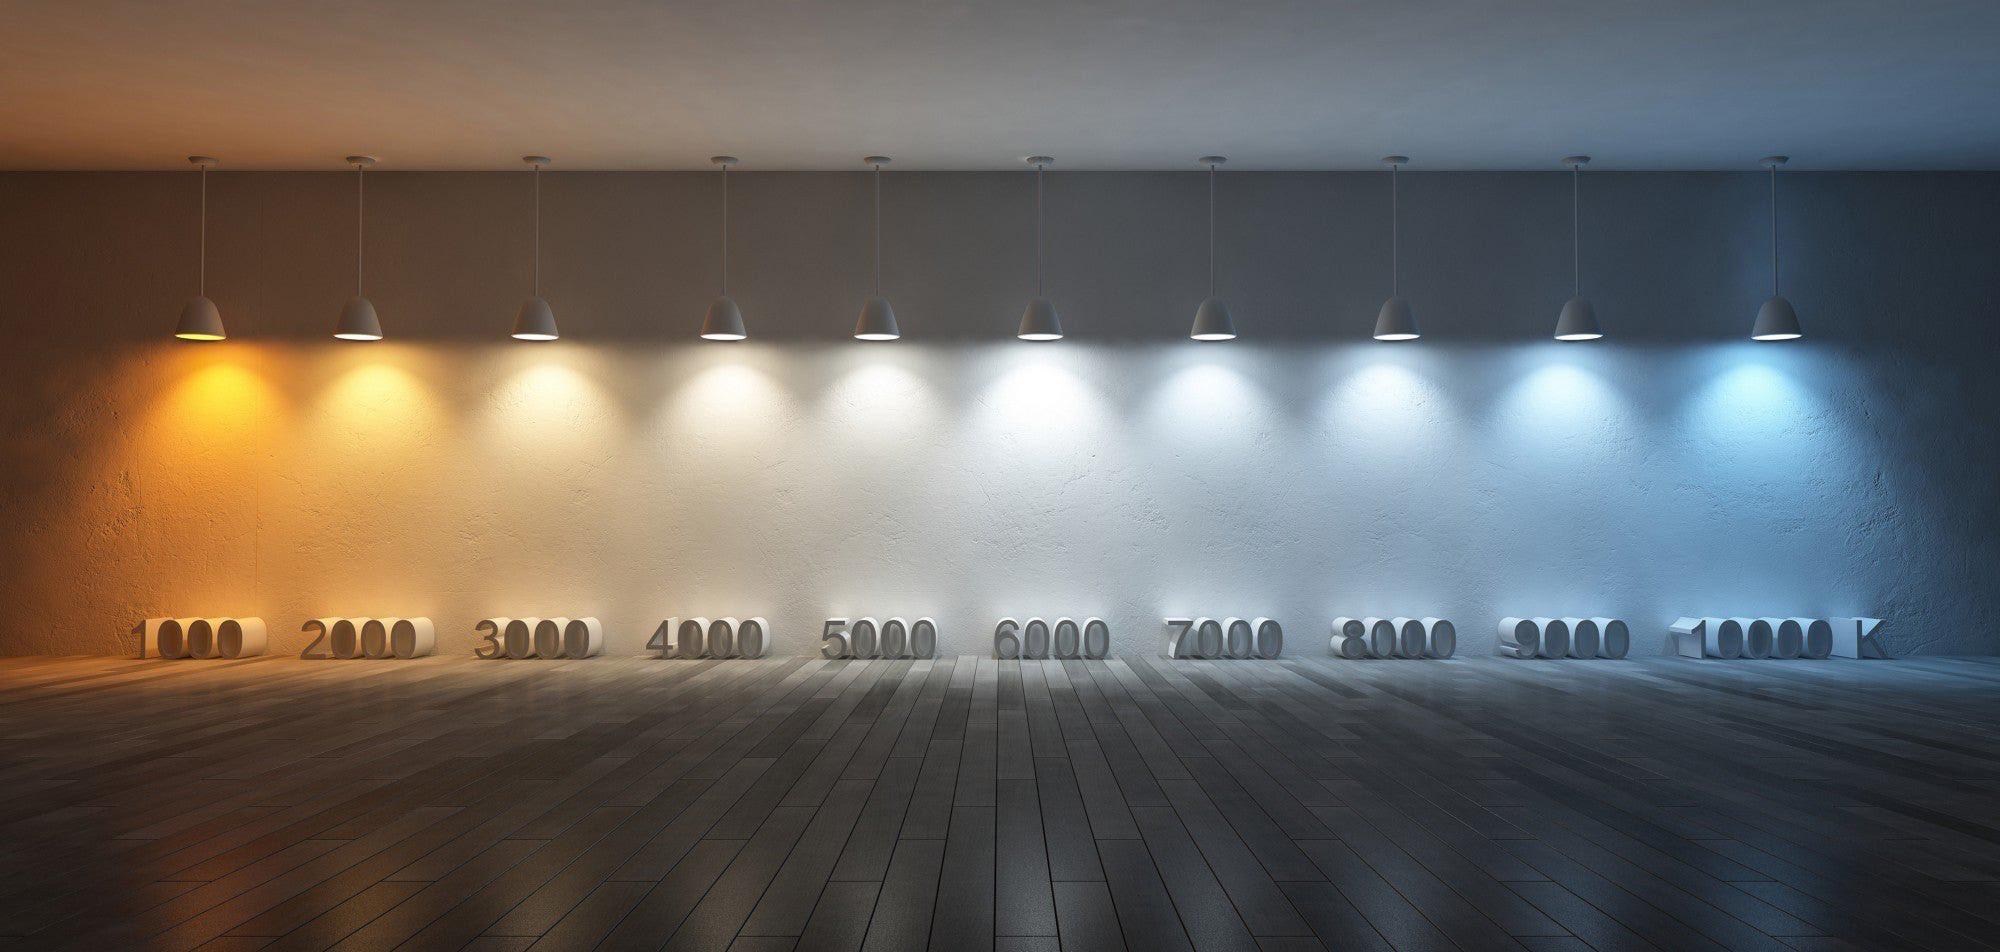 Сравнение ламп разных температур